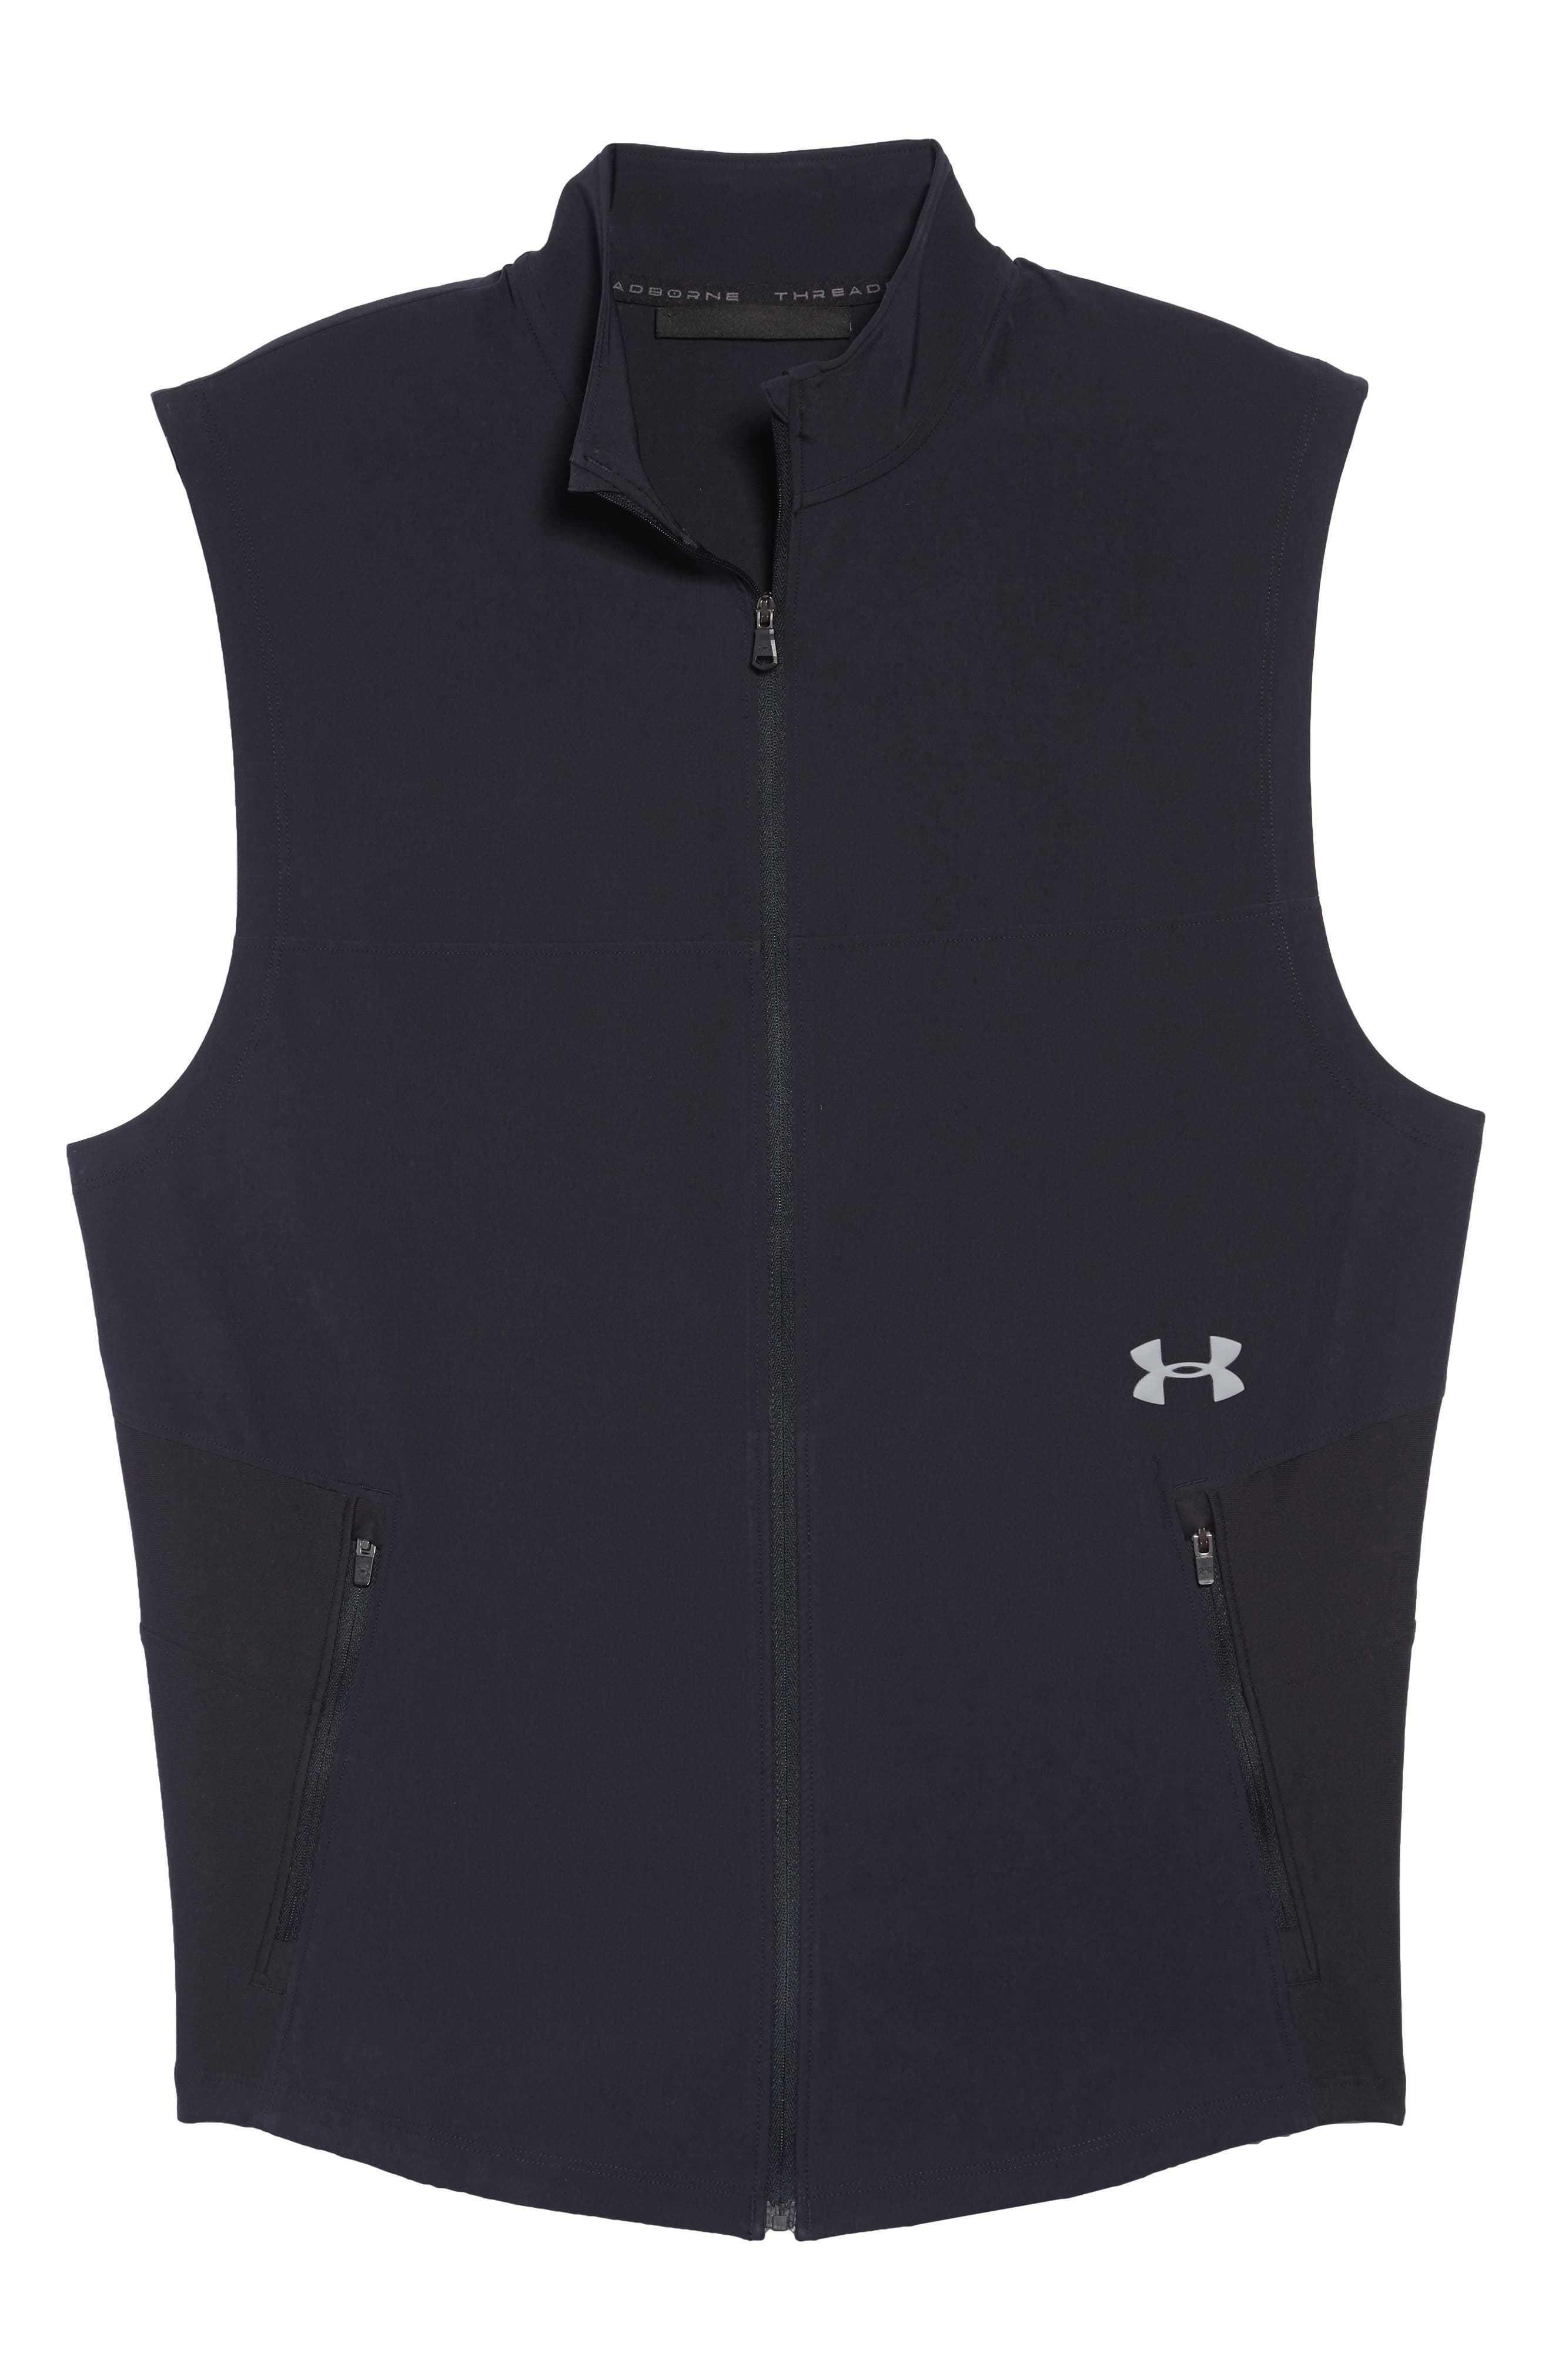 Threadborne Vanish Vest,                             Alternate thumbnail 6, color,                             001